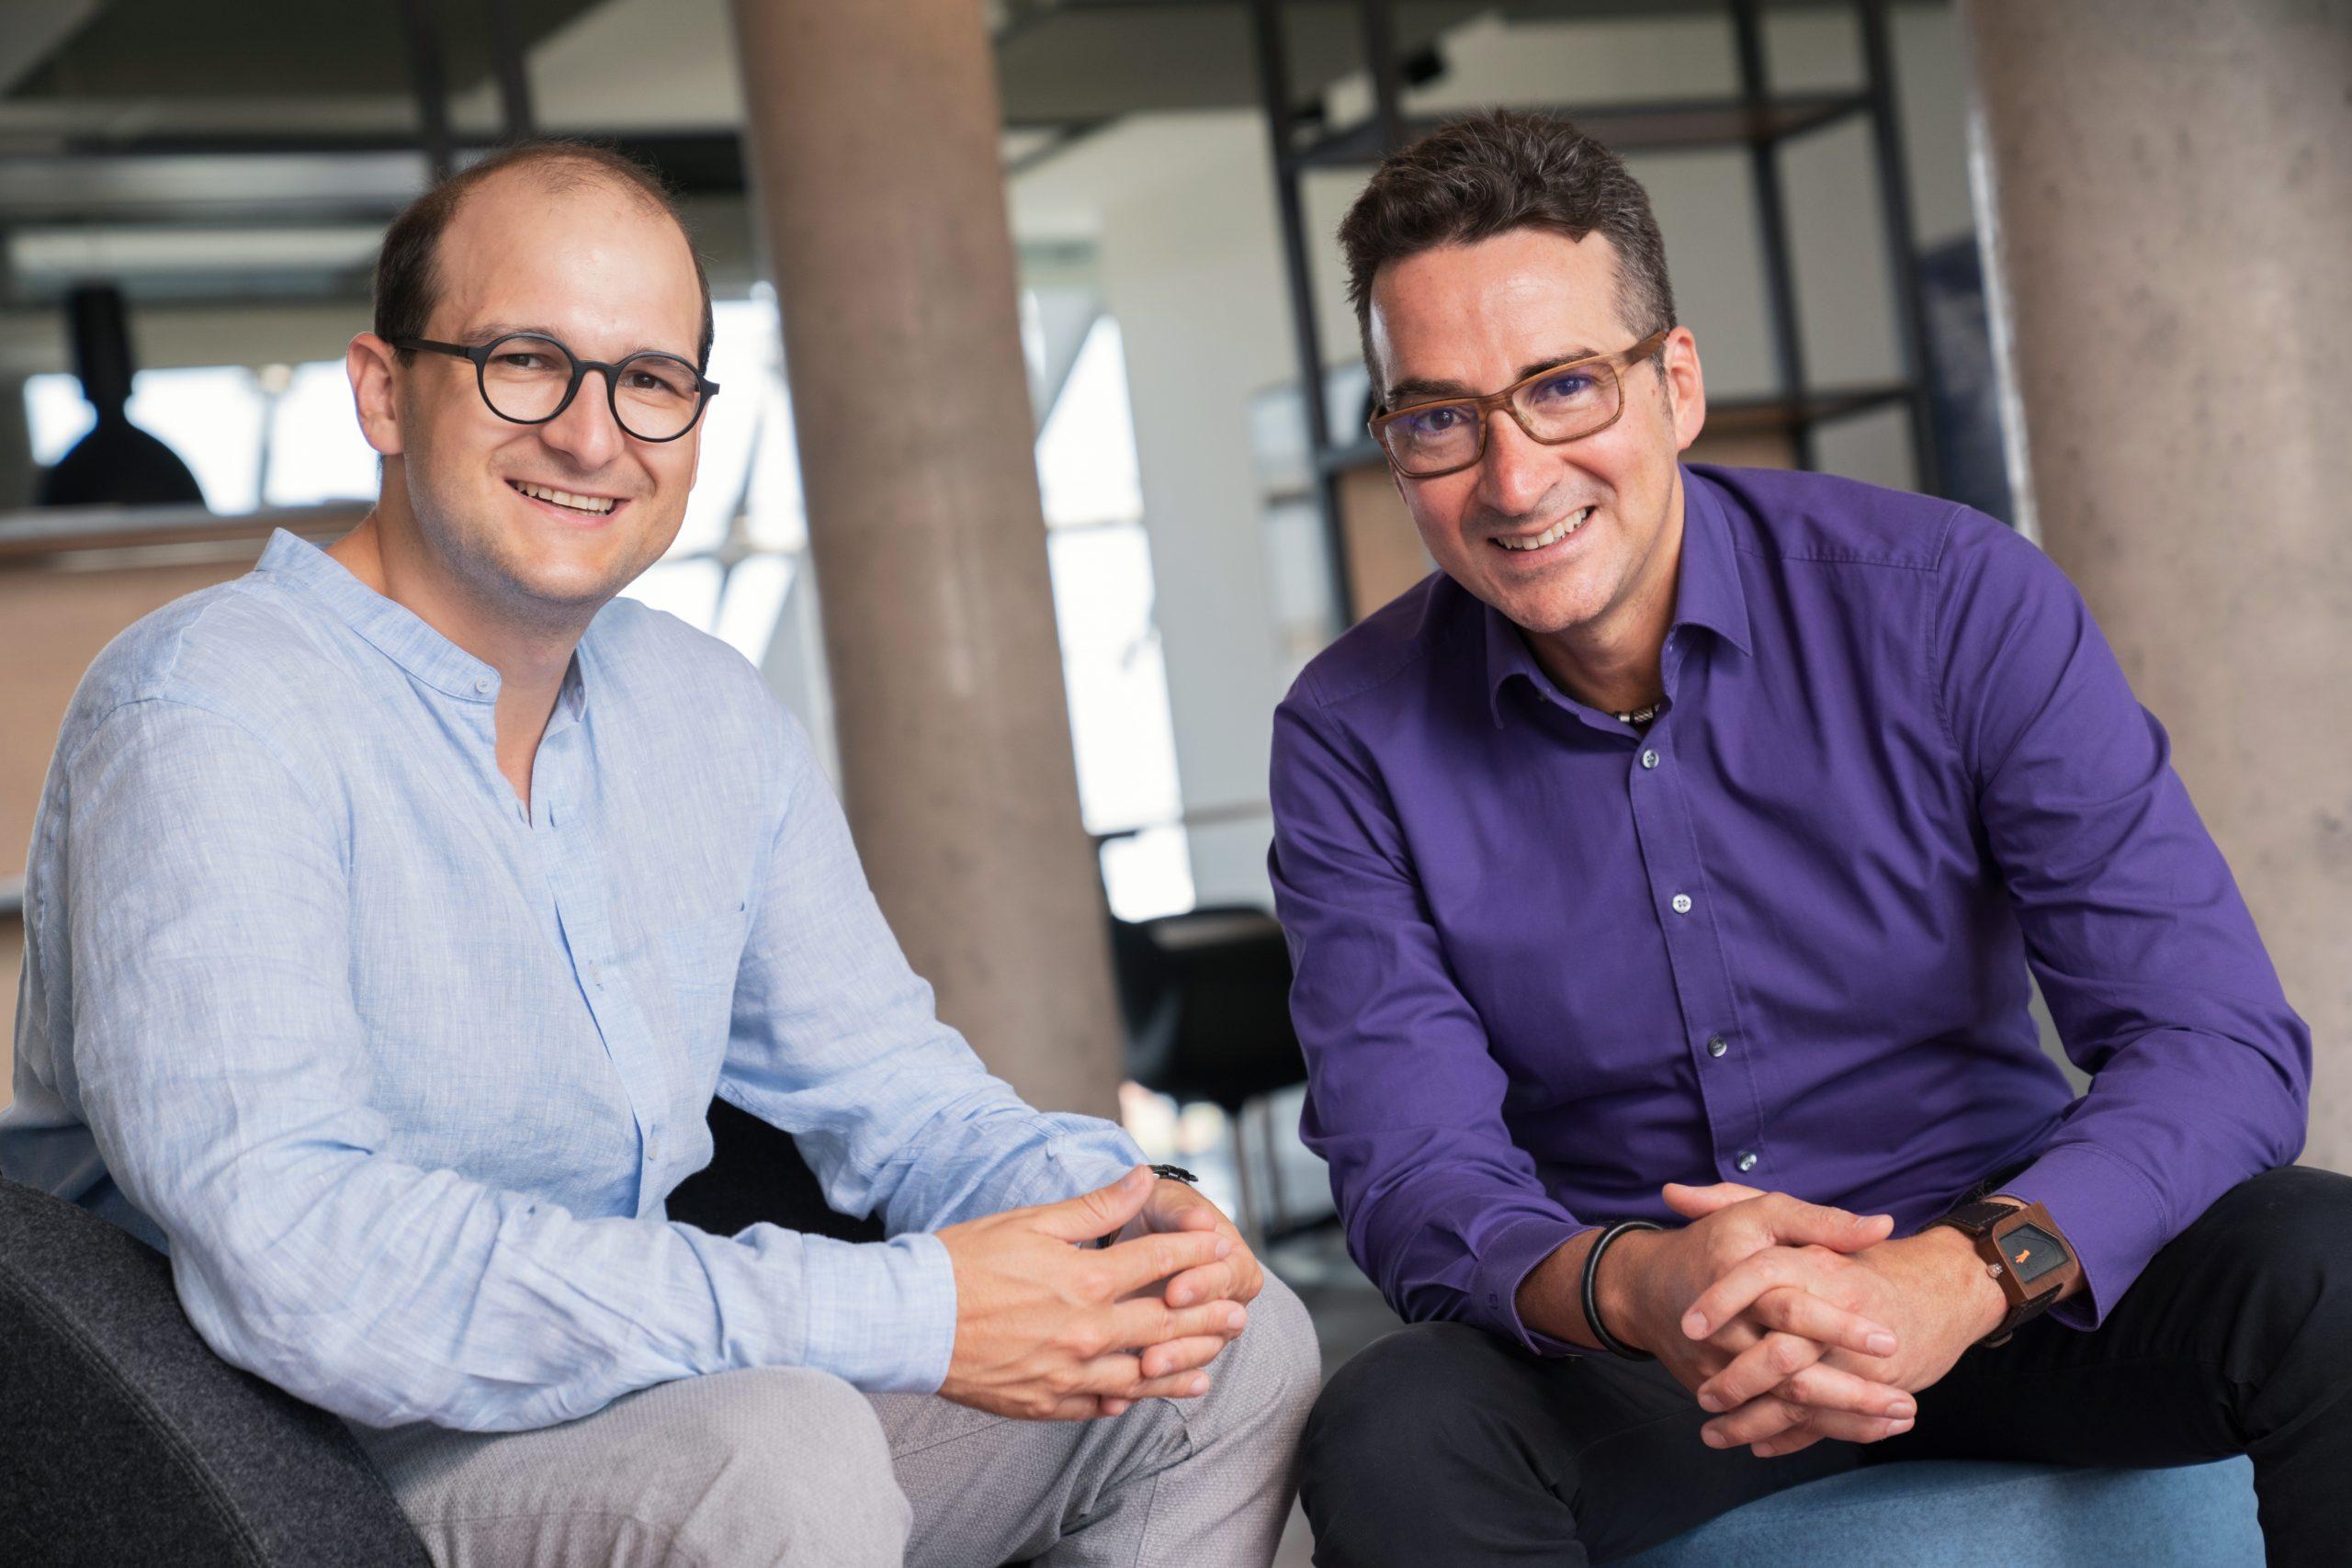 Asdrúbal Pichardo (CEO FactoryPal, rechts) und Daniel Szabo (CEO Körber Digital, links) - (Bild: ©Jasper Ehrich Fotografie)